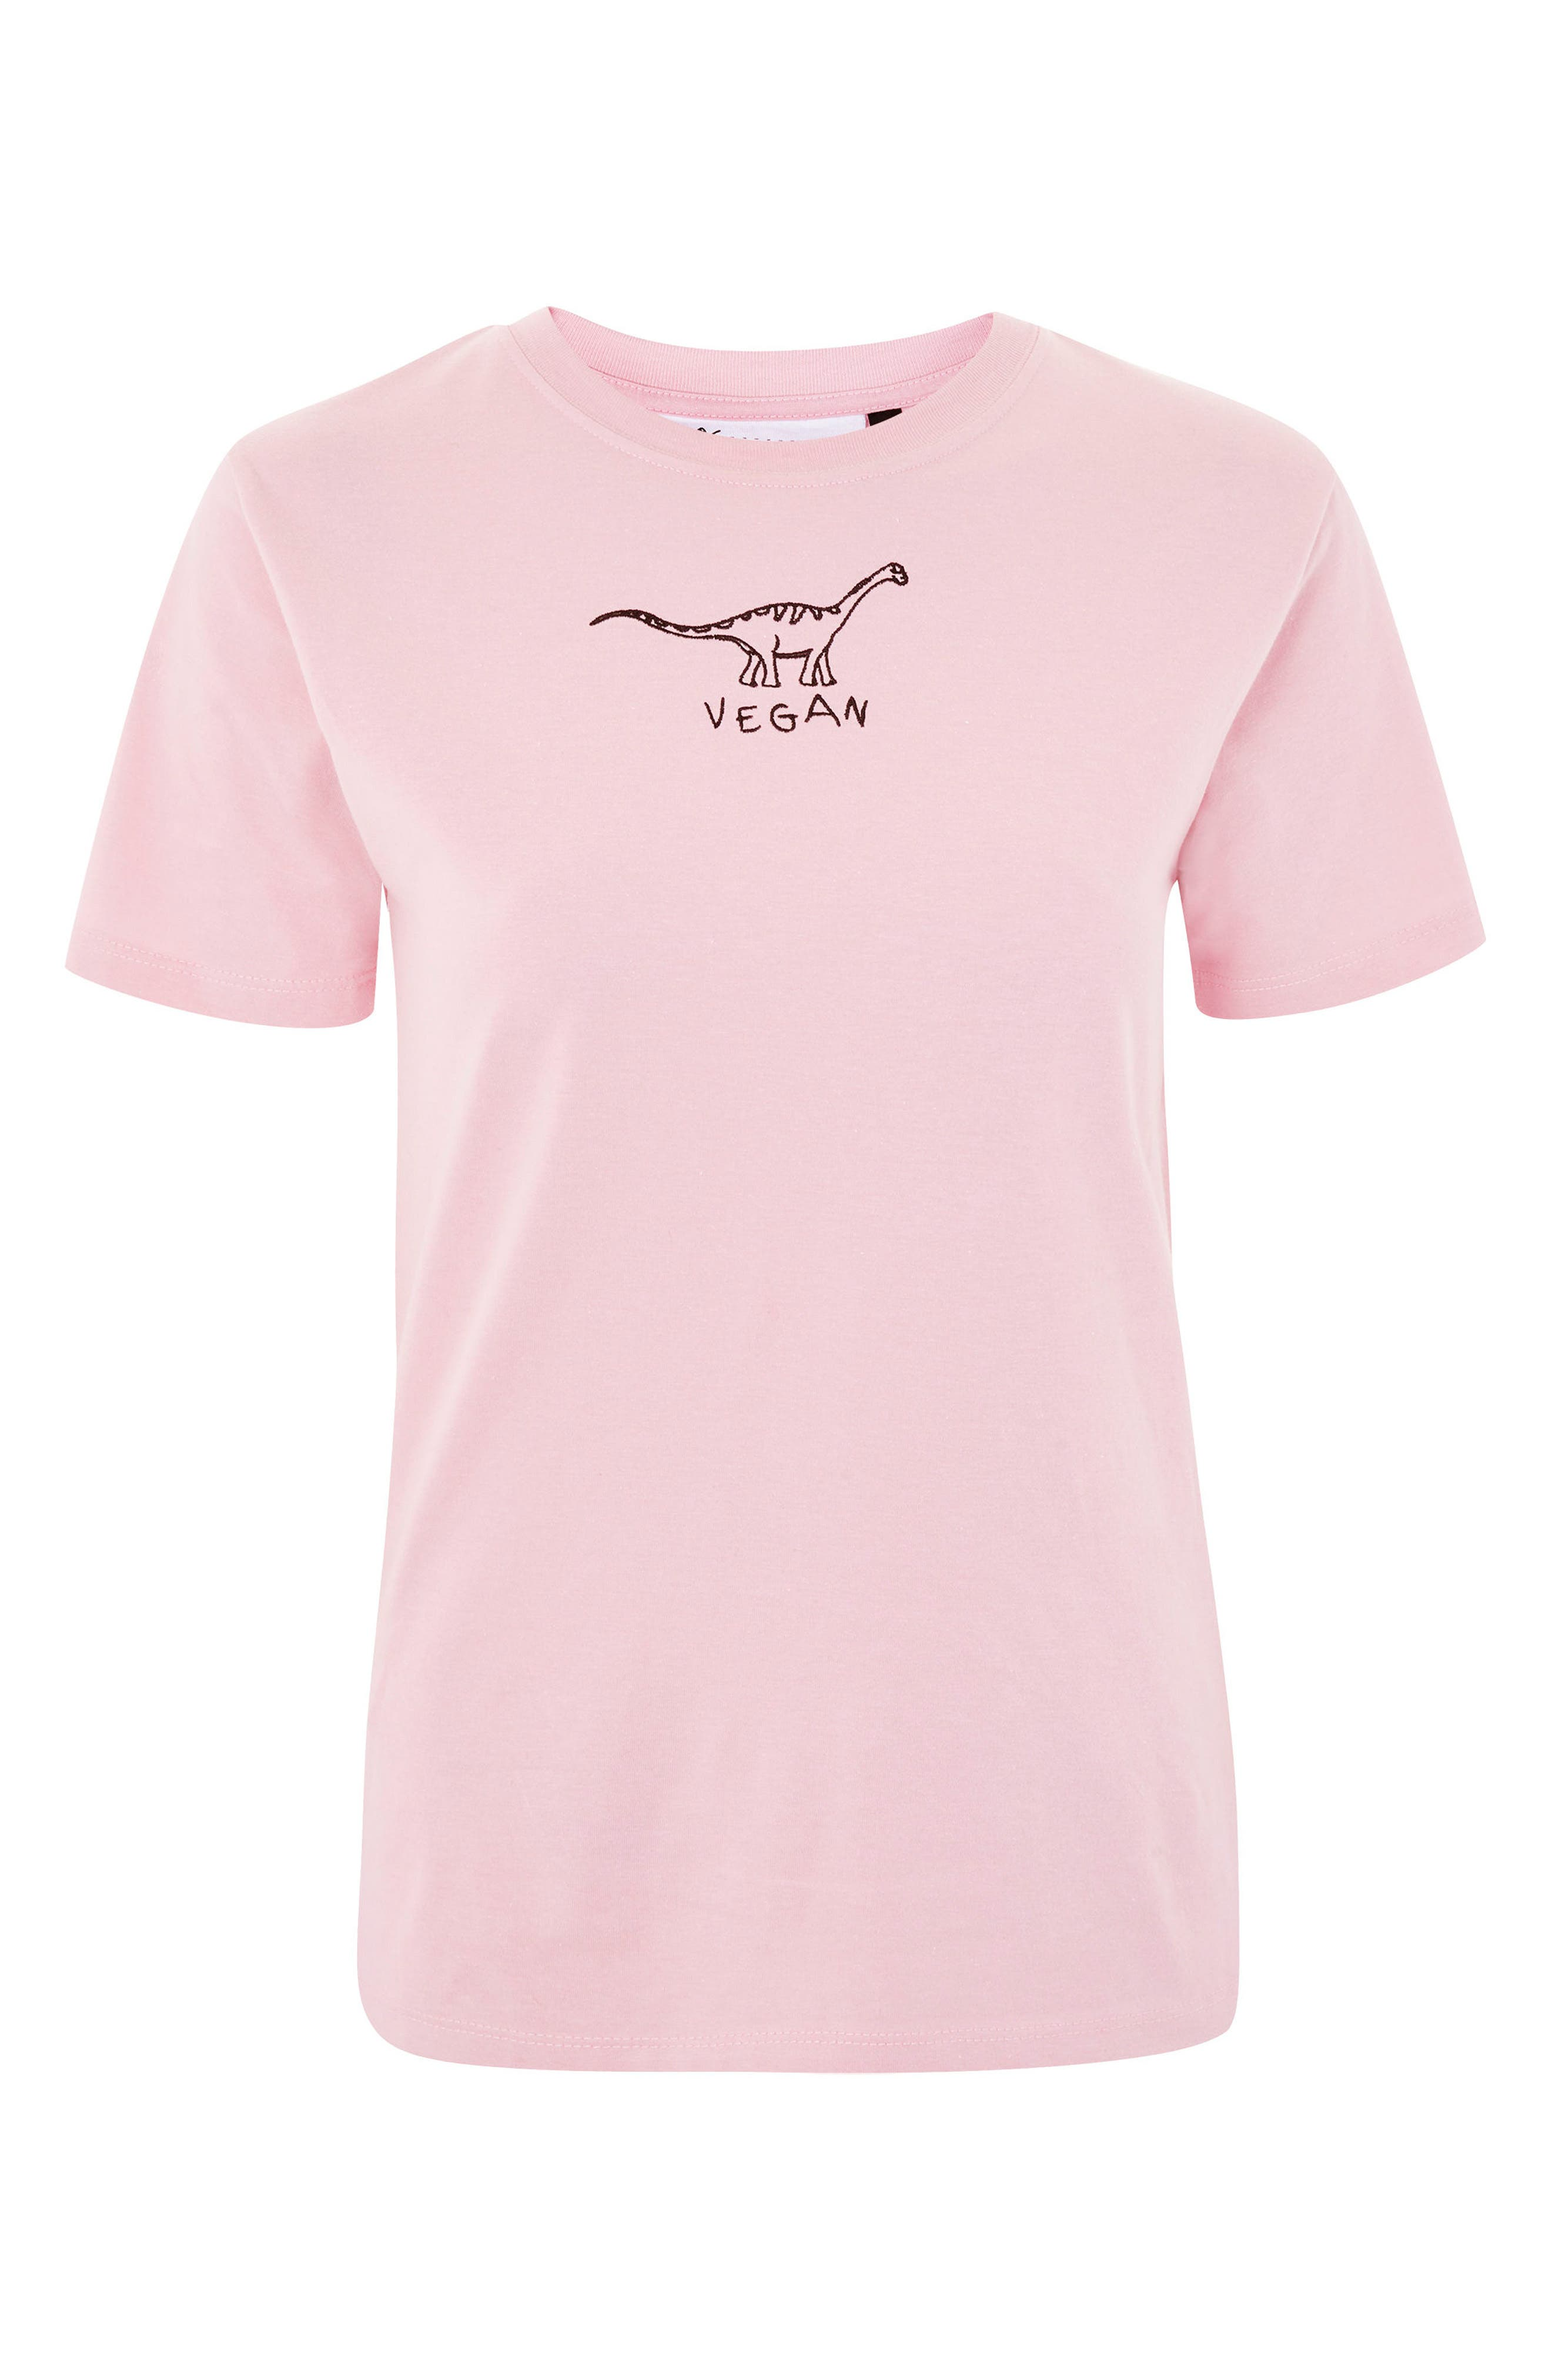 by Tee & Cake Vegan Dino T-Shirt,                             Alternate thumbnail 4, color,                             Pink